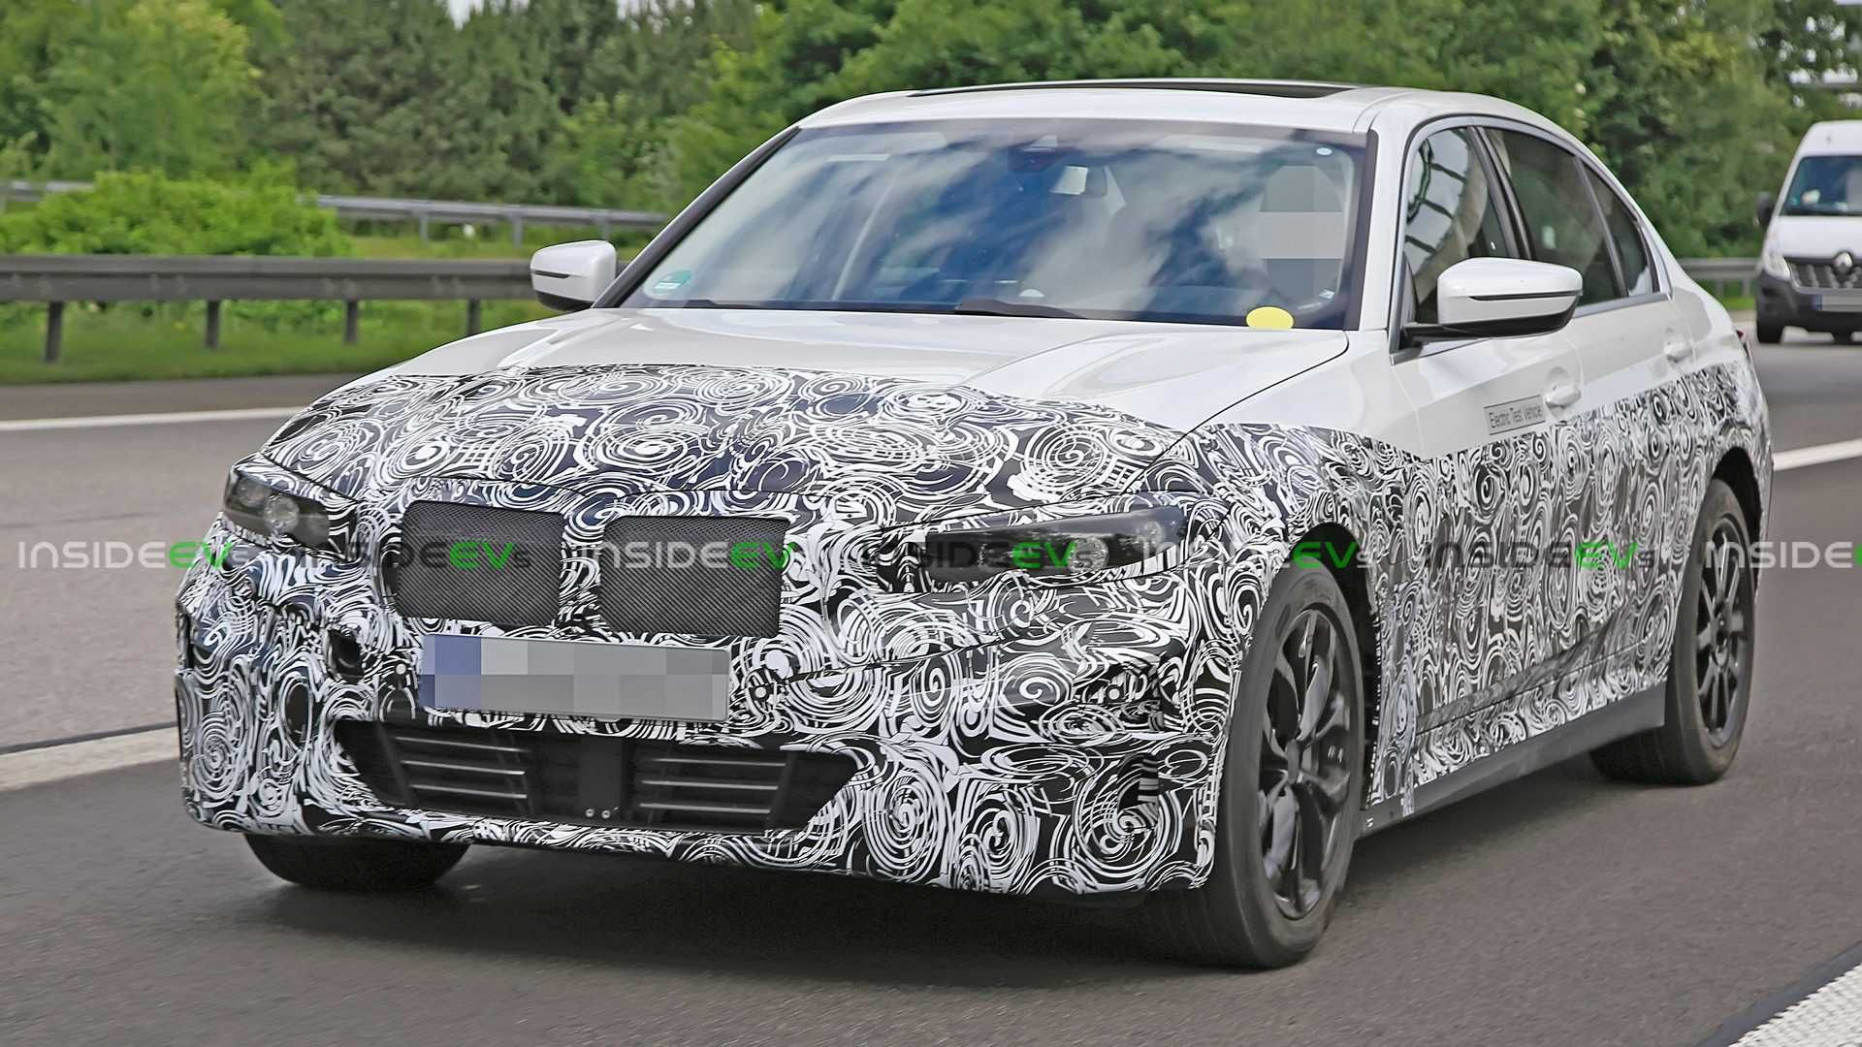 Exterior BMW Electric Vehicles 2022